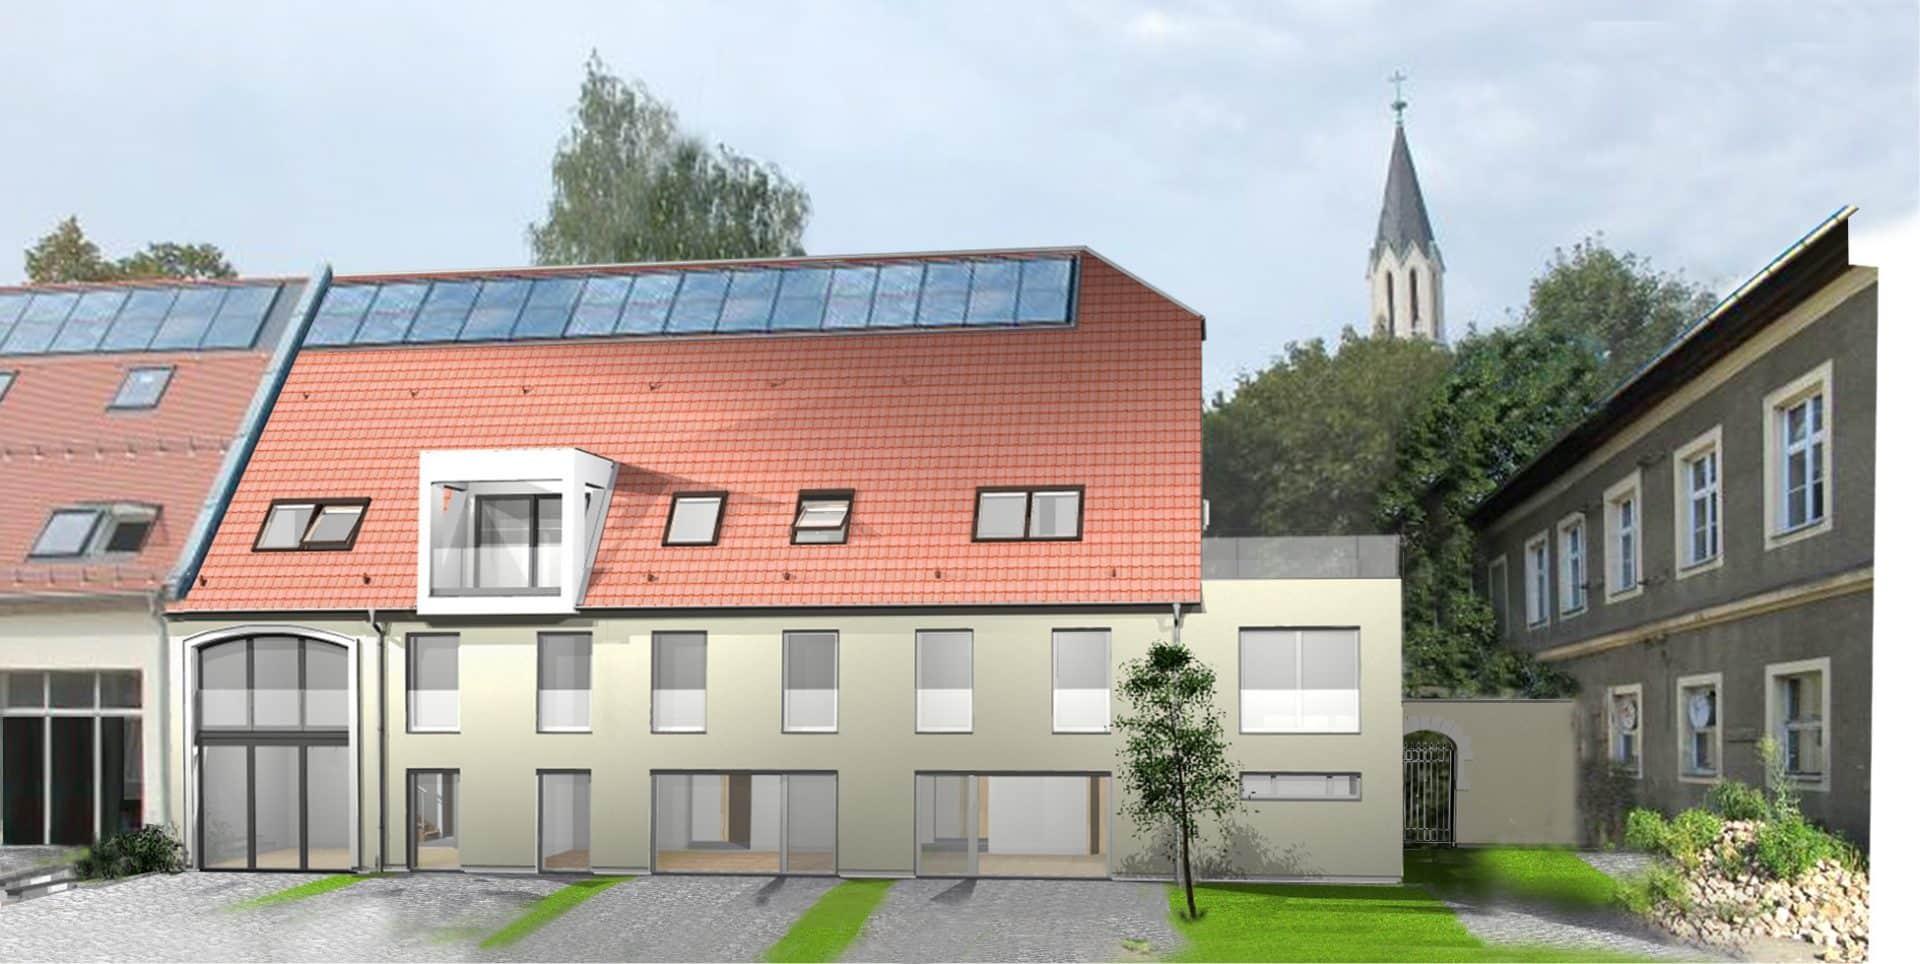 Ritterhof Hof 040919 1